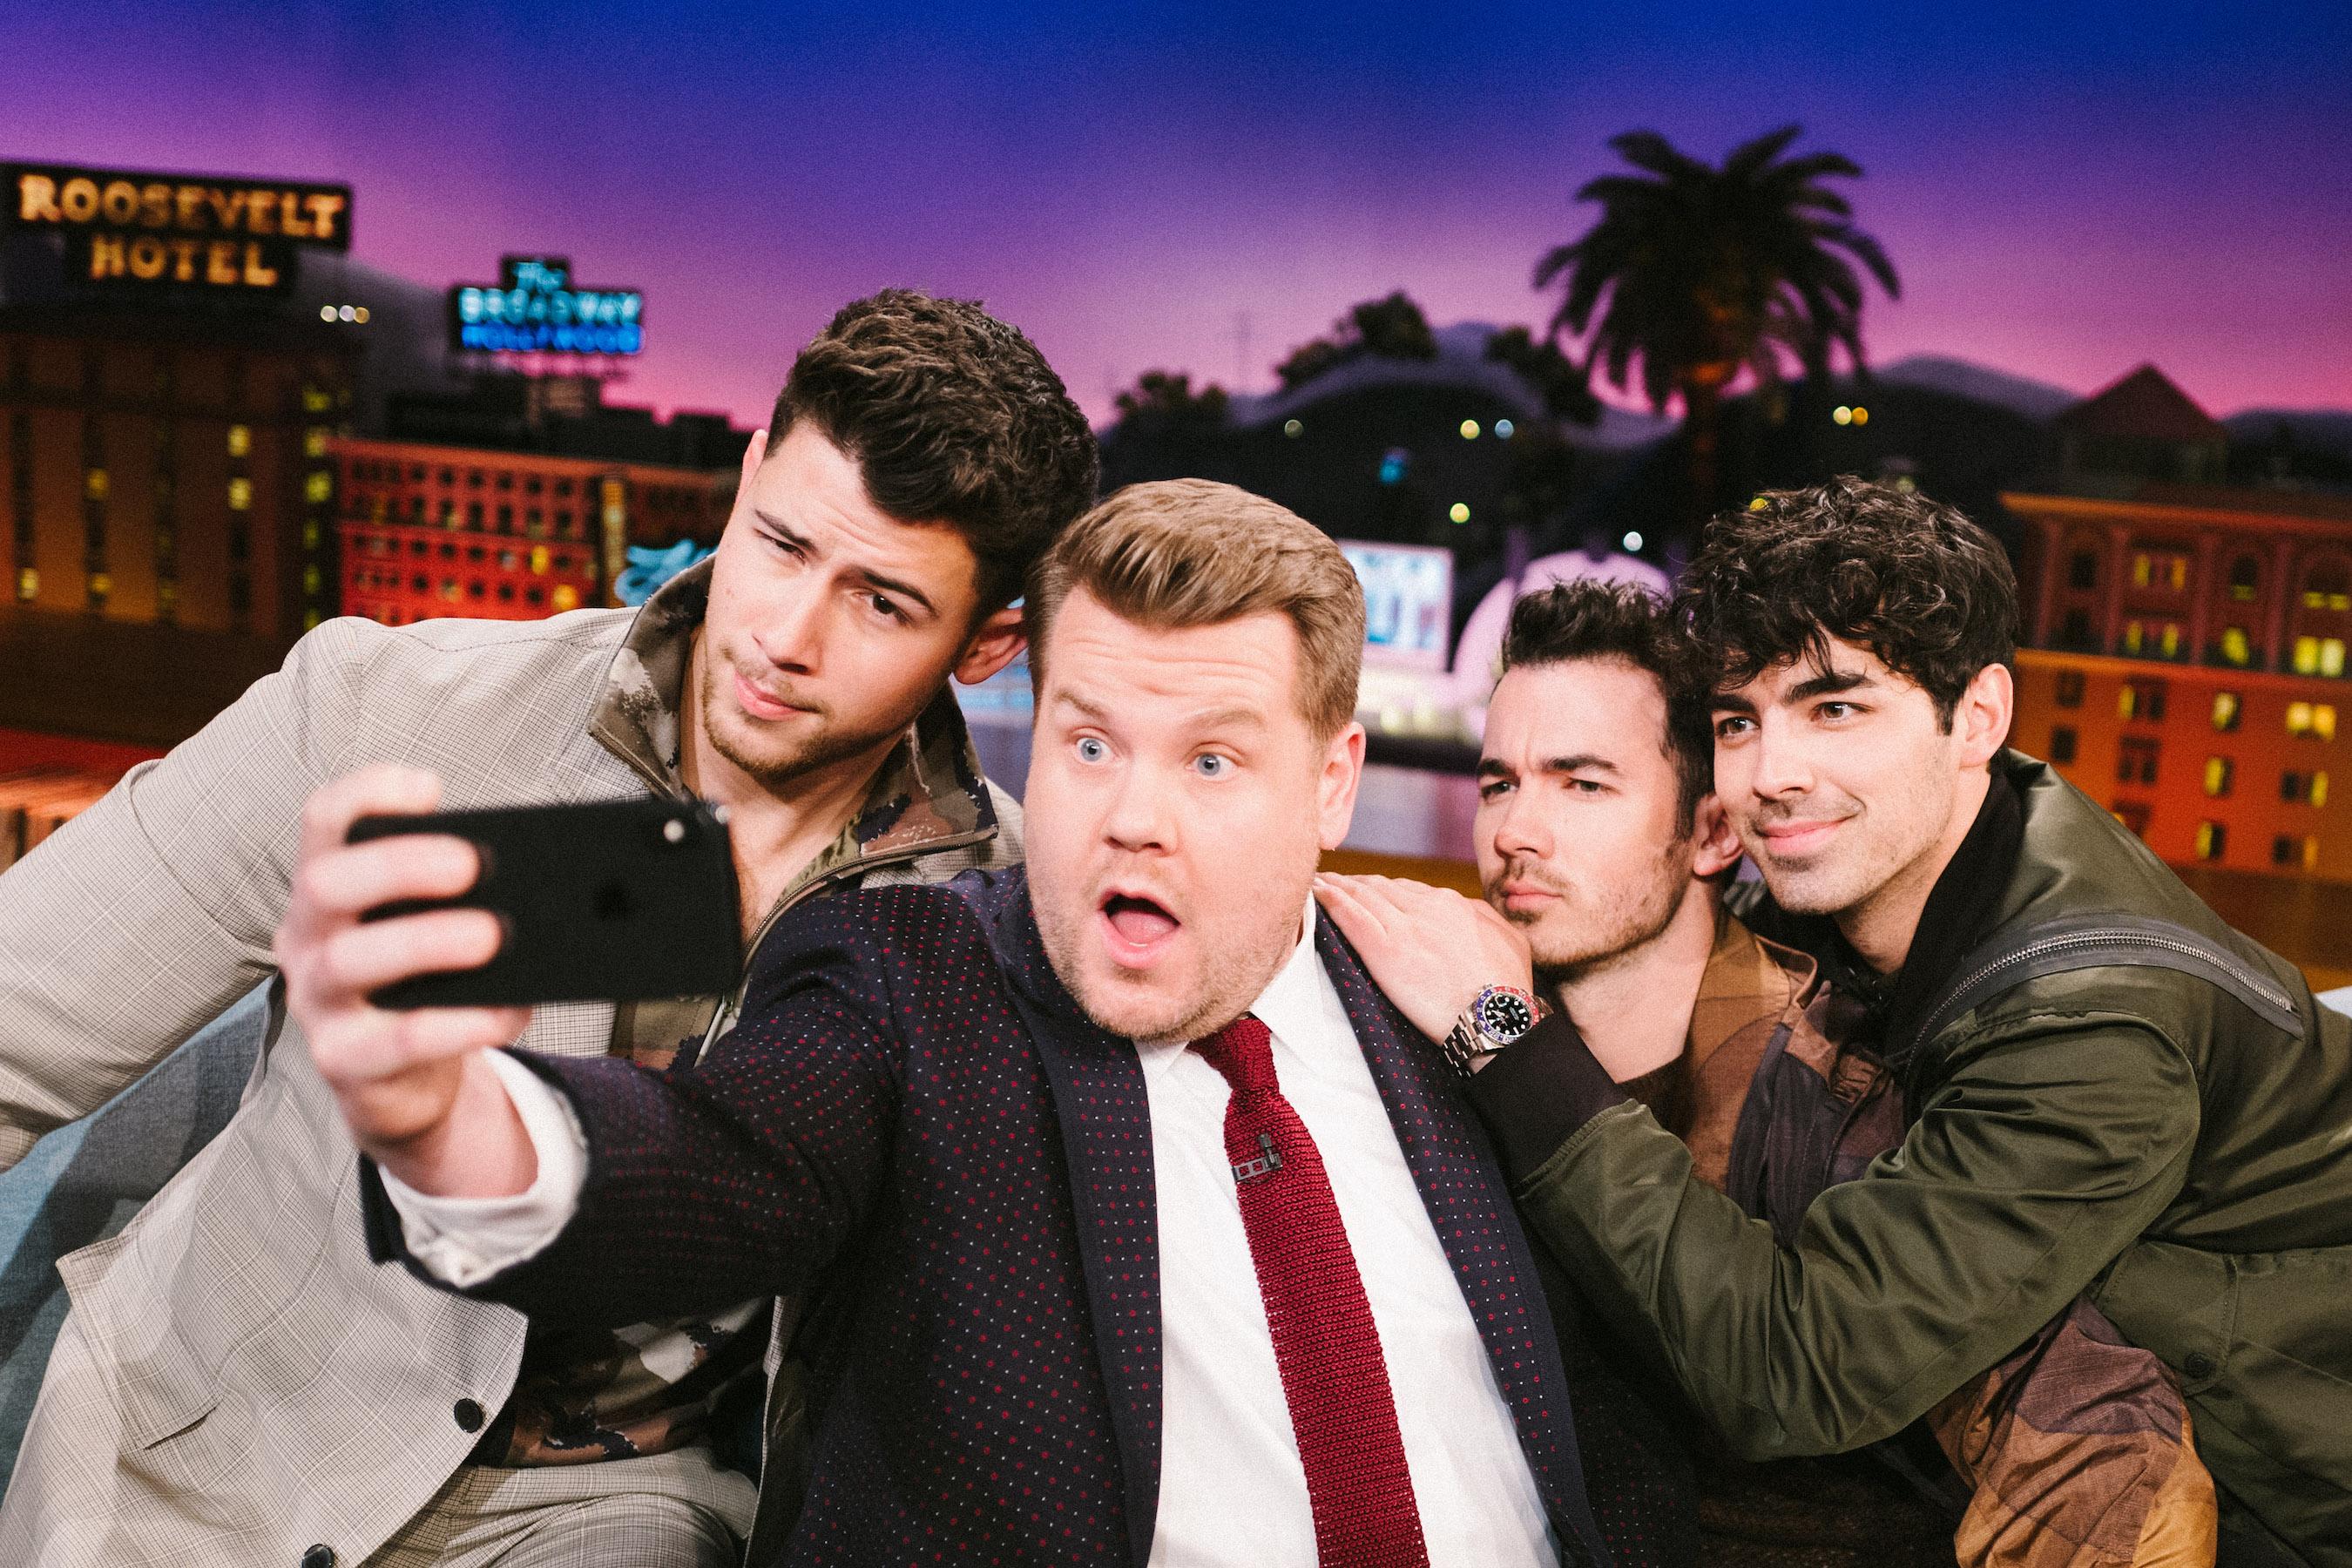 The Jonas Selfie